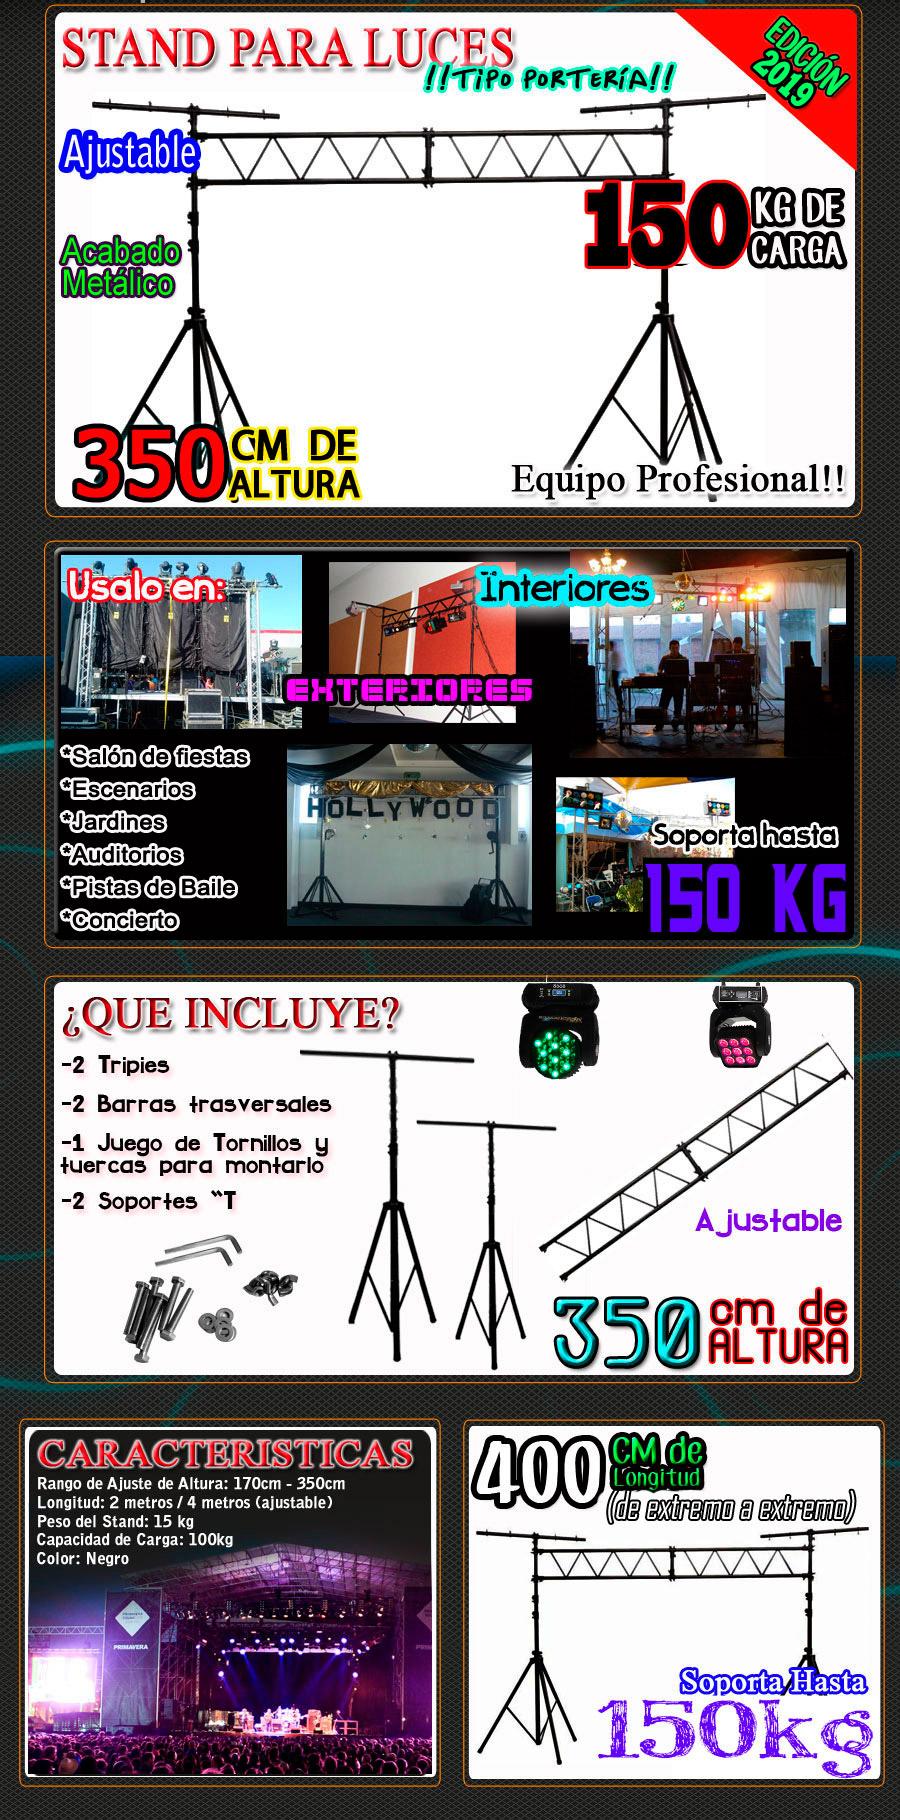 http://www.vecctronica.com/vecc-articulos/Producto/porteria-luces/principal.jpg